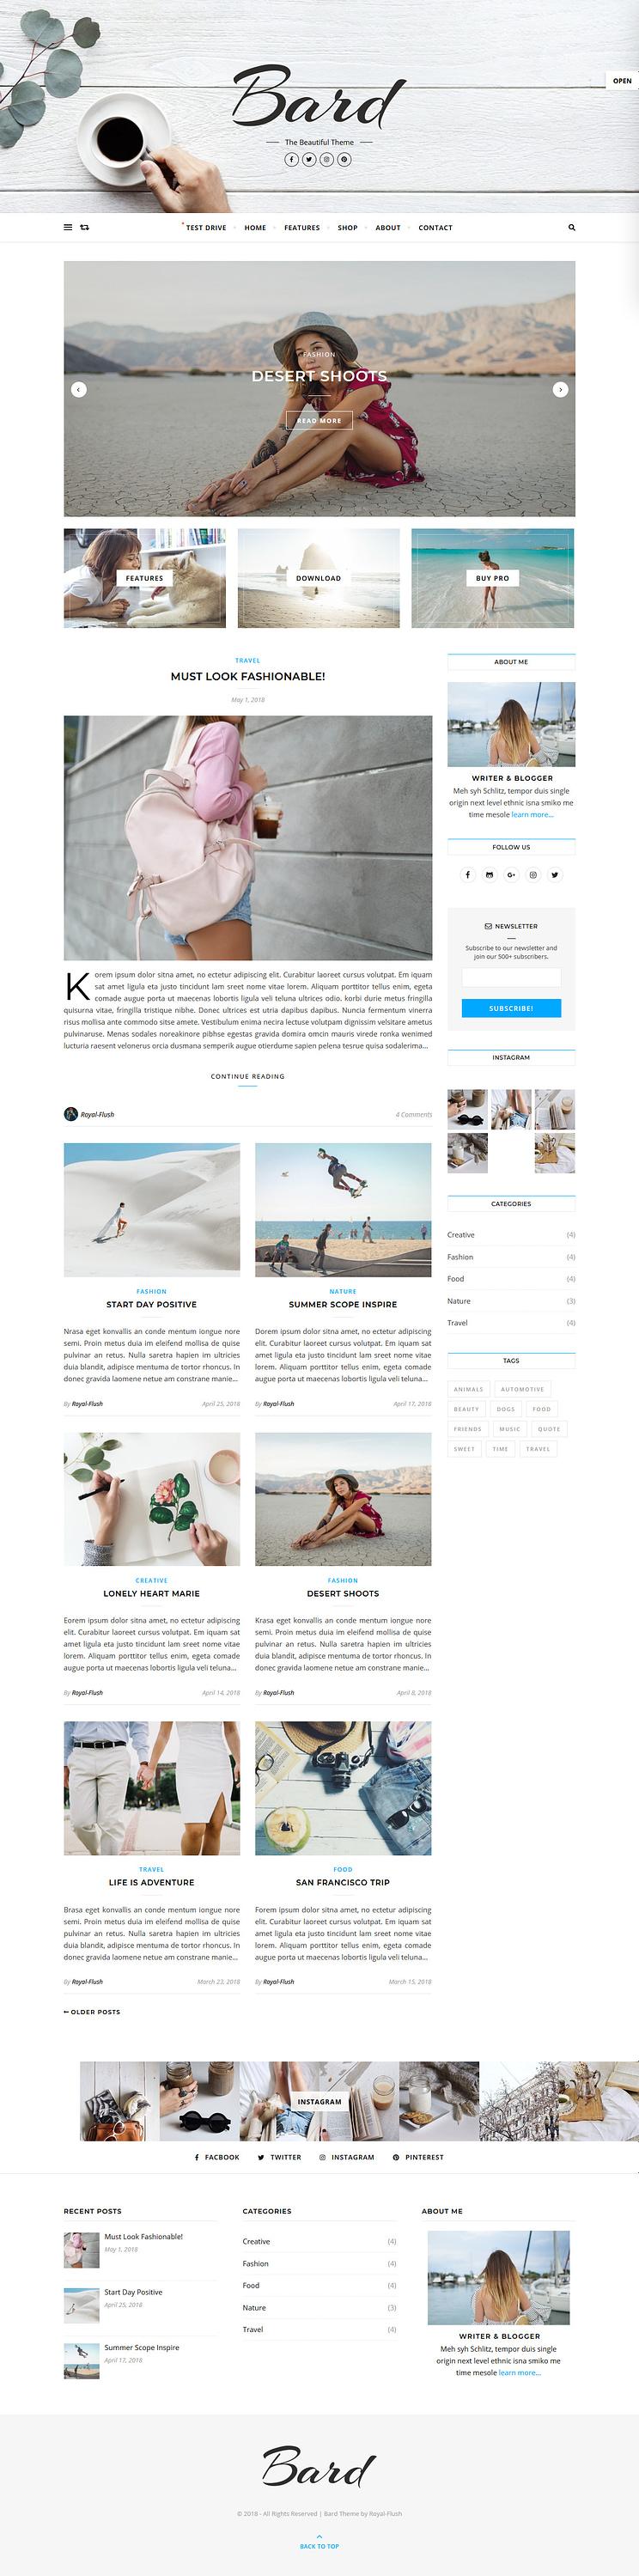 Bard - Best Free Fullscreen WordPress Theme